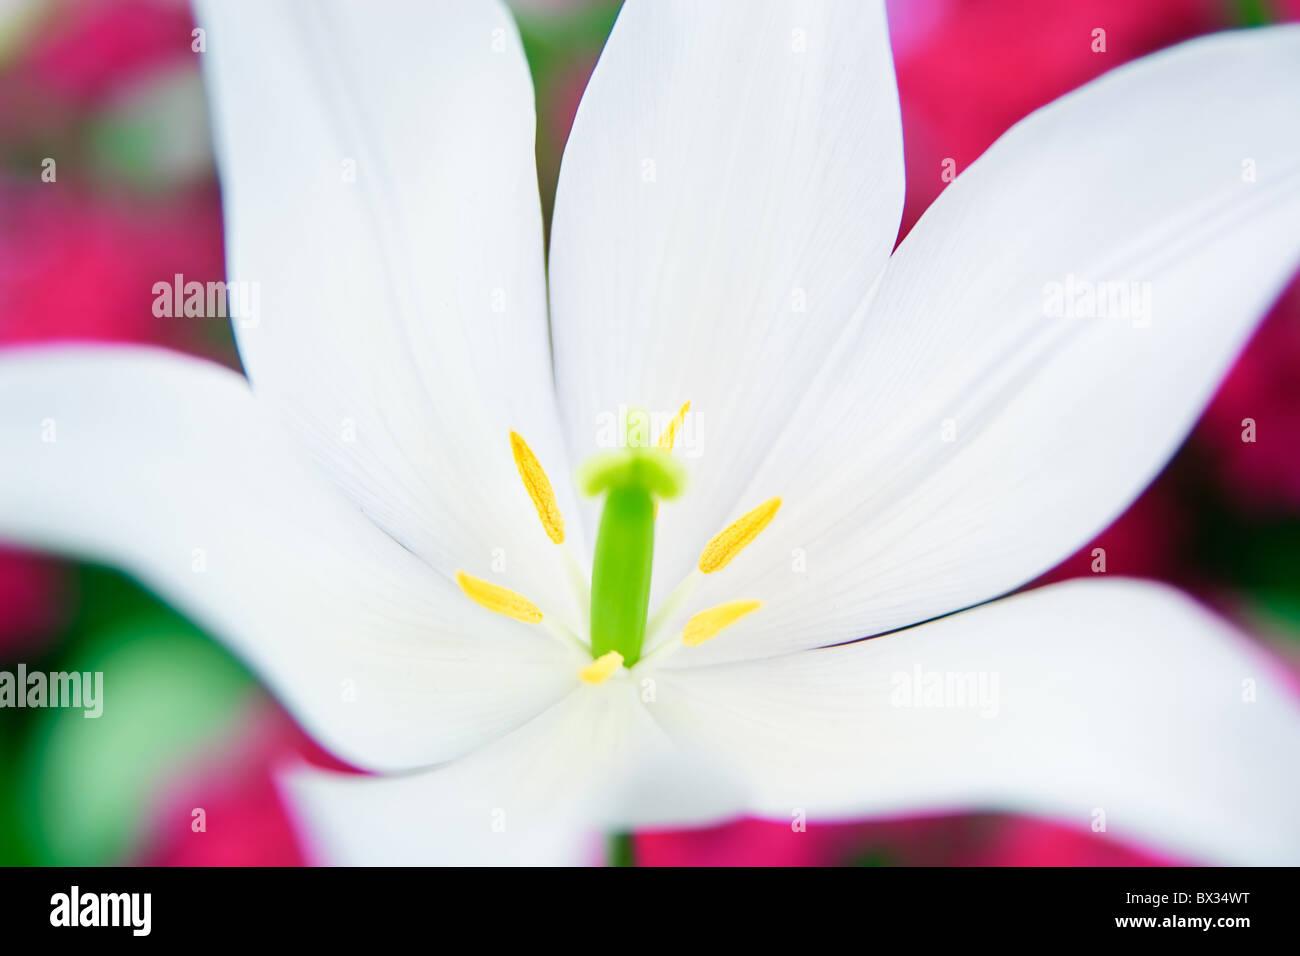 Primerísimo primer plano de un lirio blanco con fondo de color rosa Foto de stock